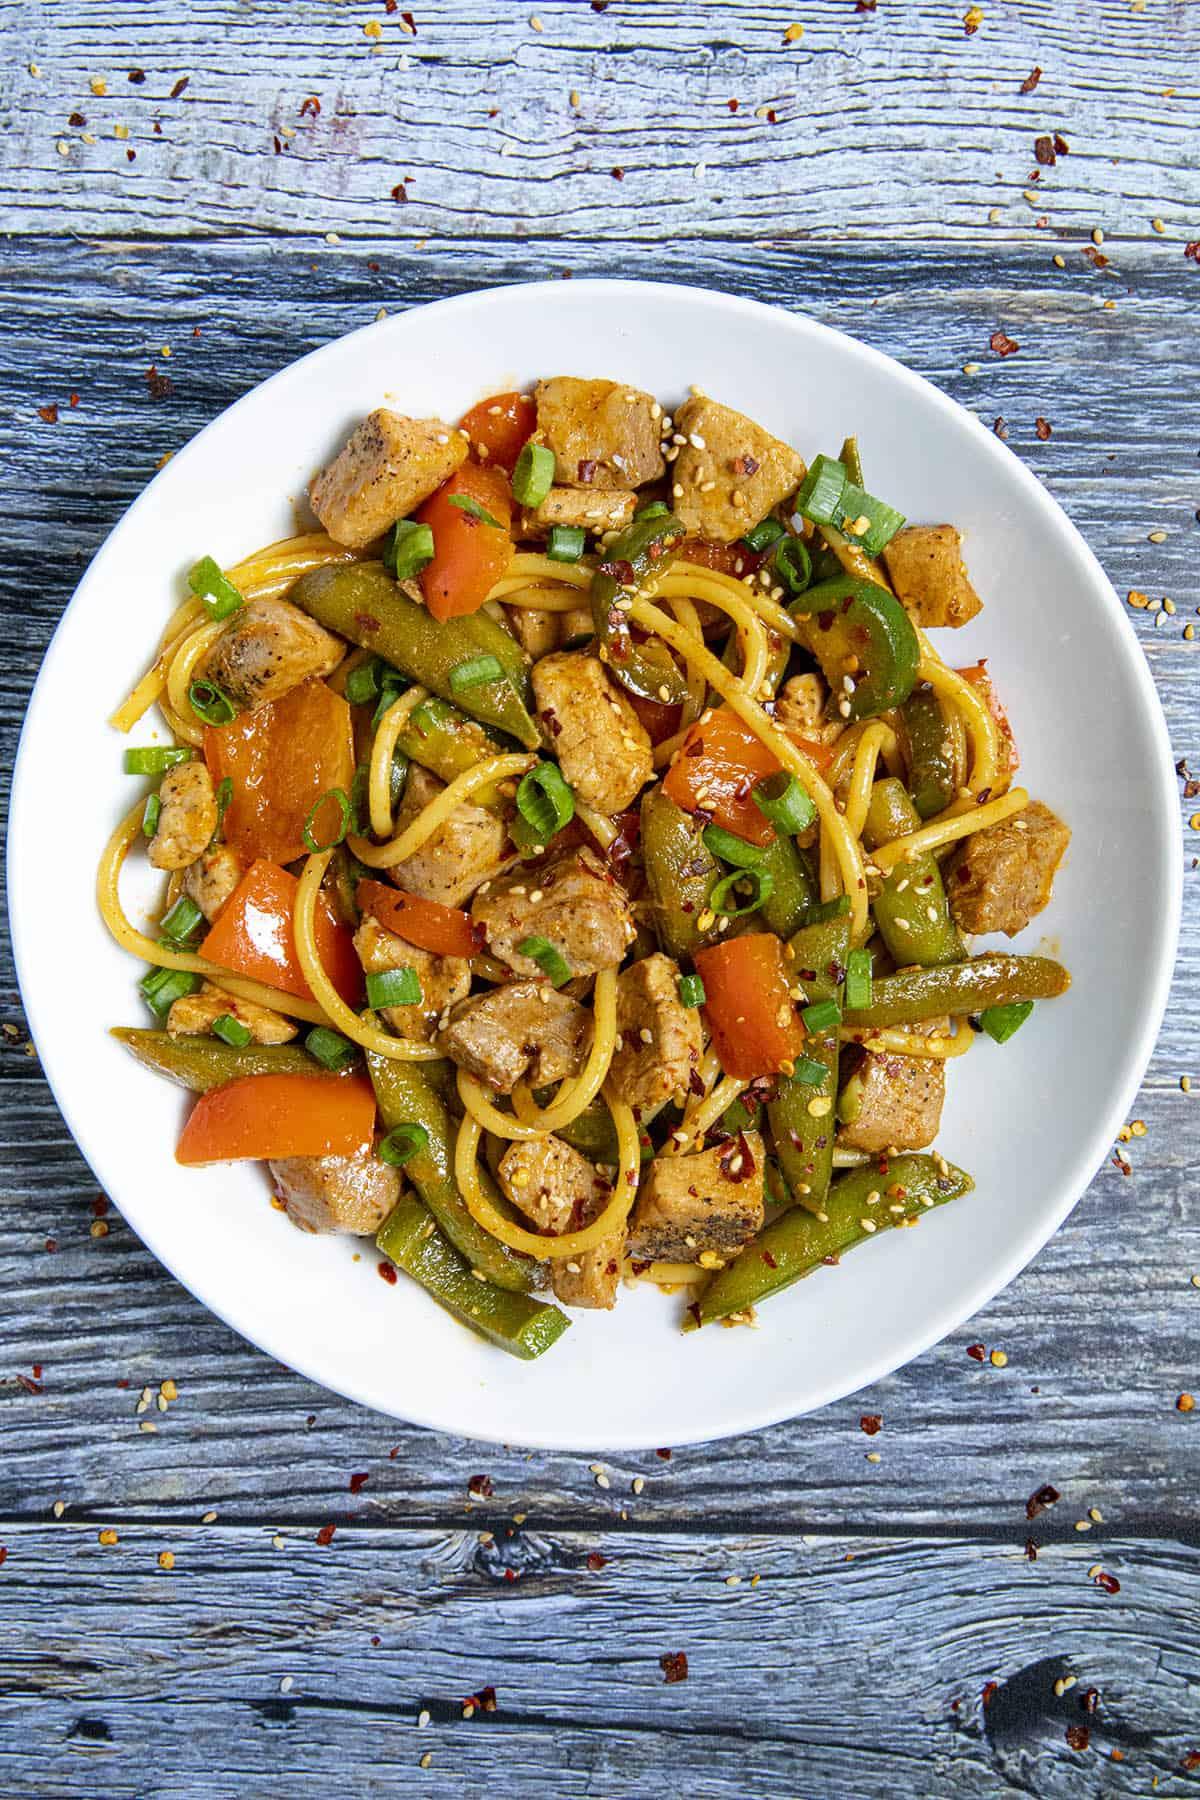 Spicy Pork Stir Fry in a bowl, ready to serve